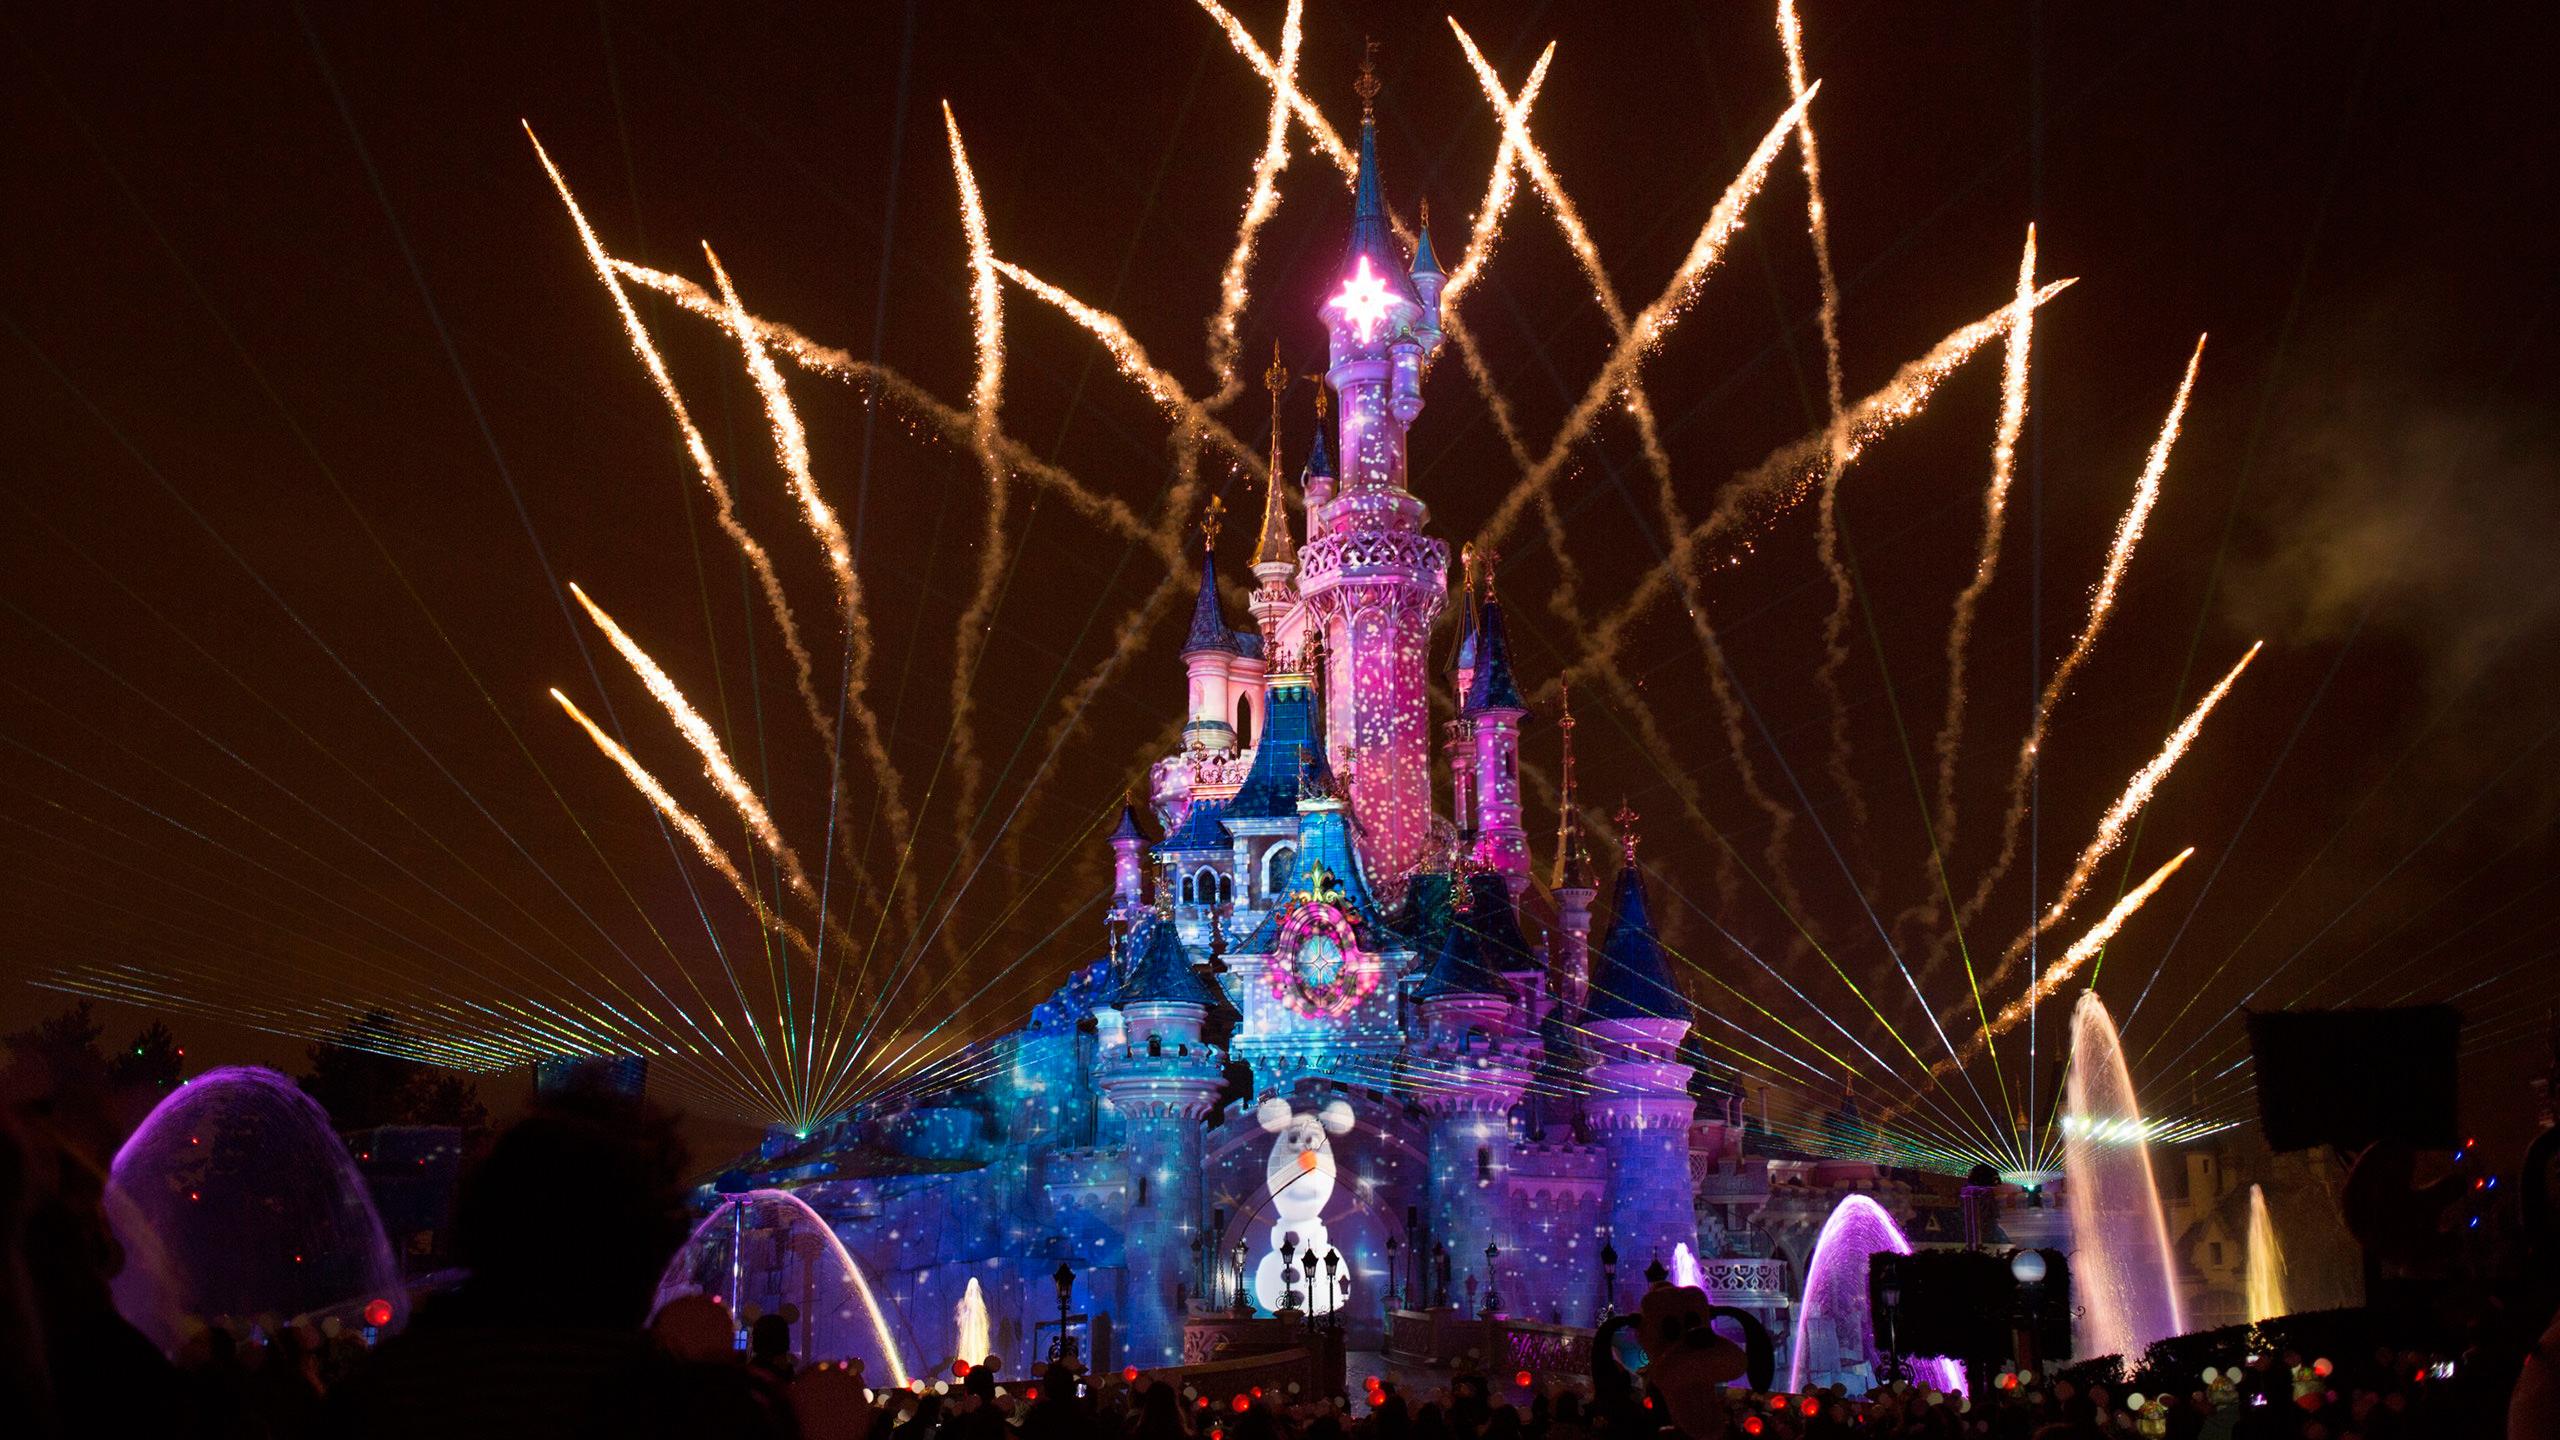 repas de noel disneyland 2018 Hello Disneyland : Le blog n°1 sur Disneyland Paris | Réveillons  repas de noel disneyland 2018